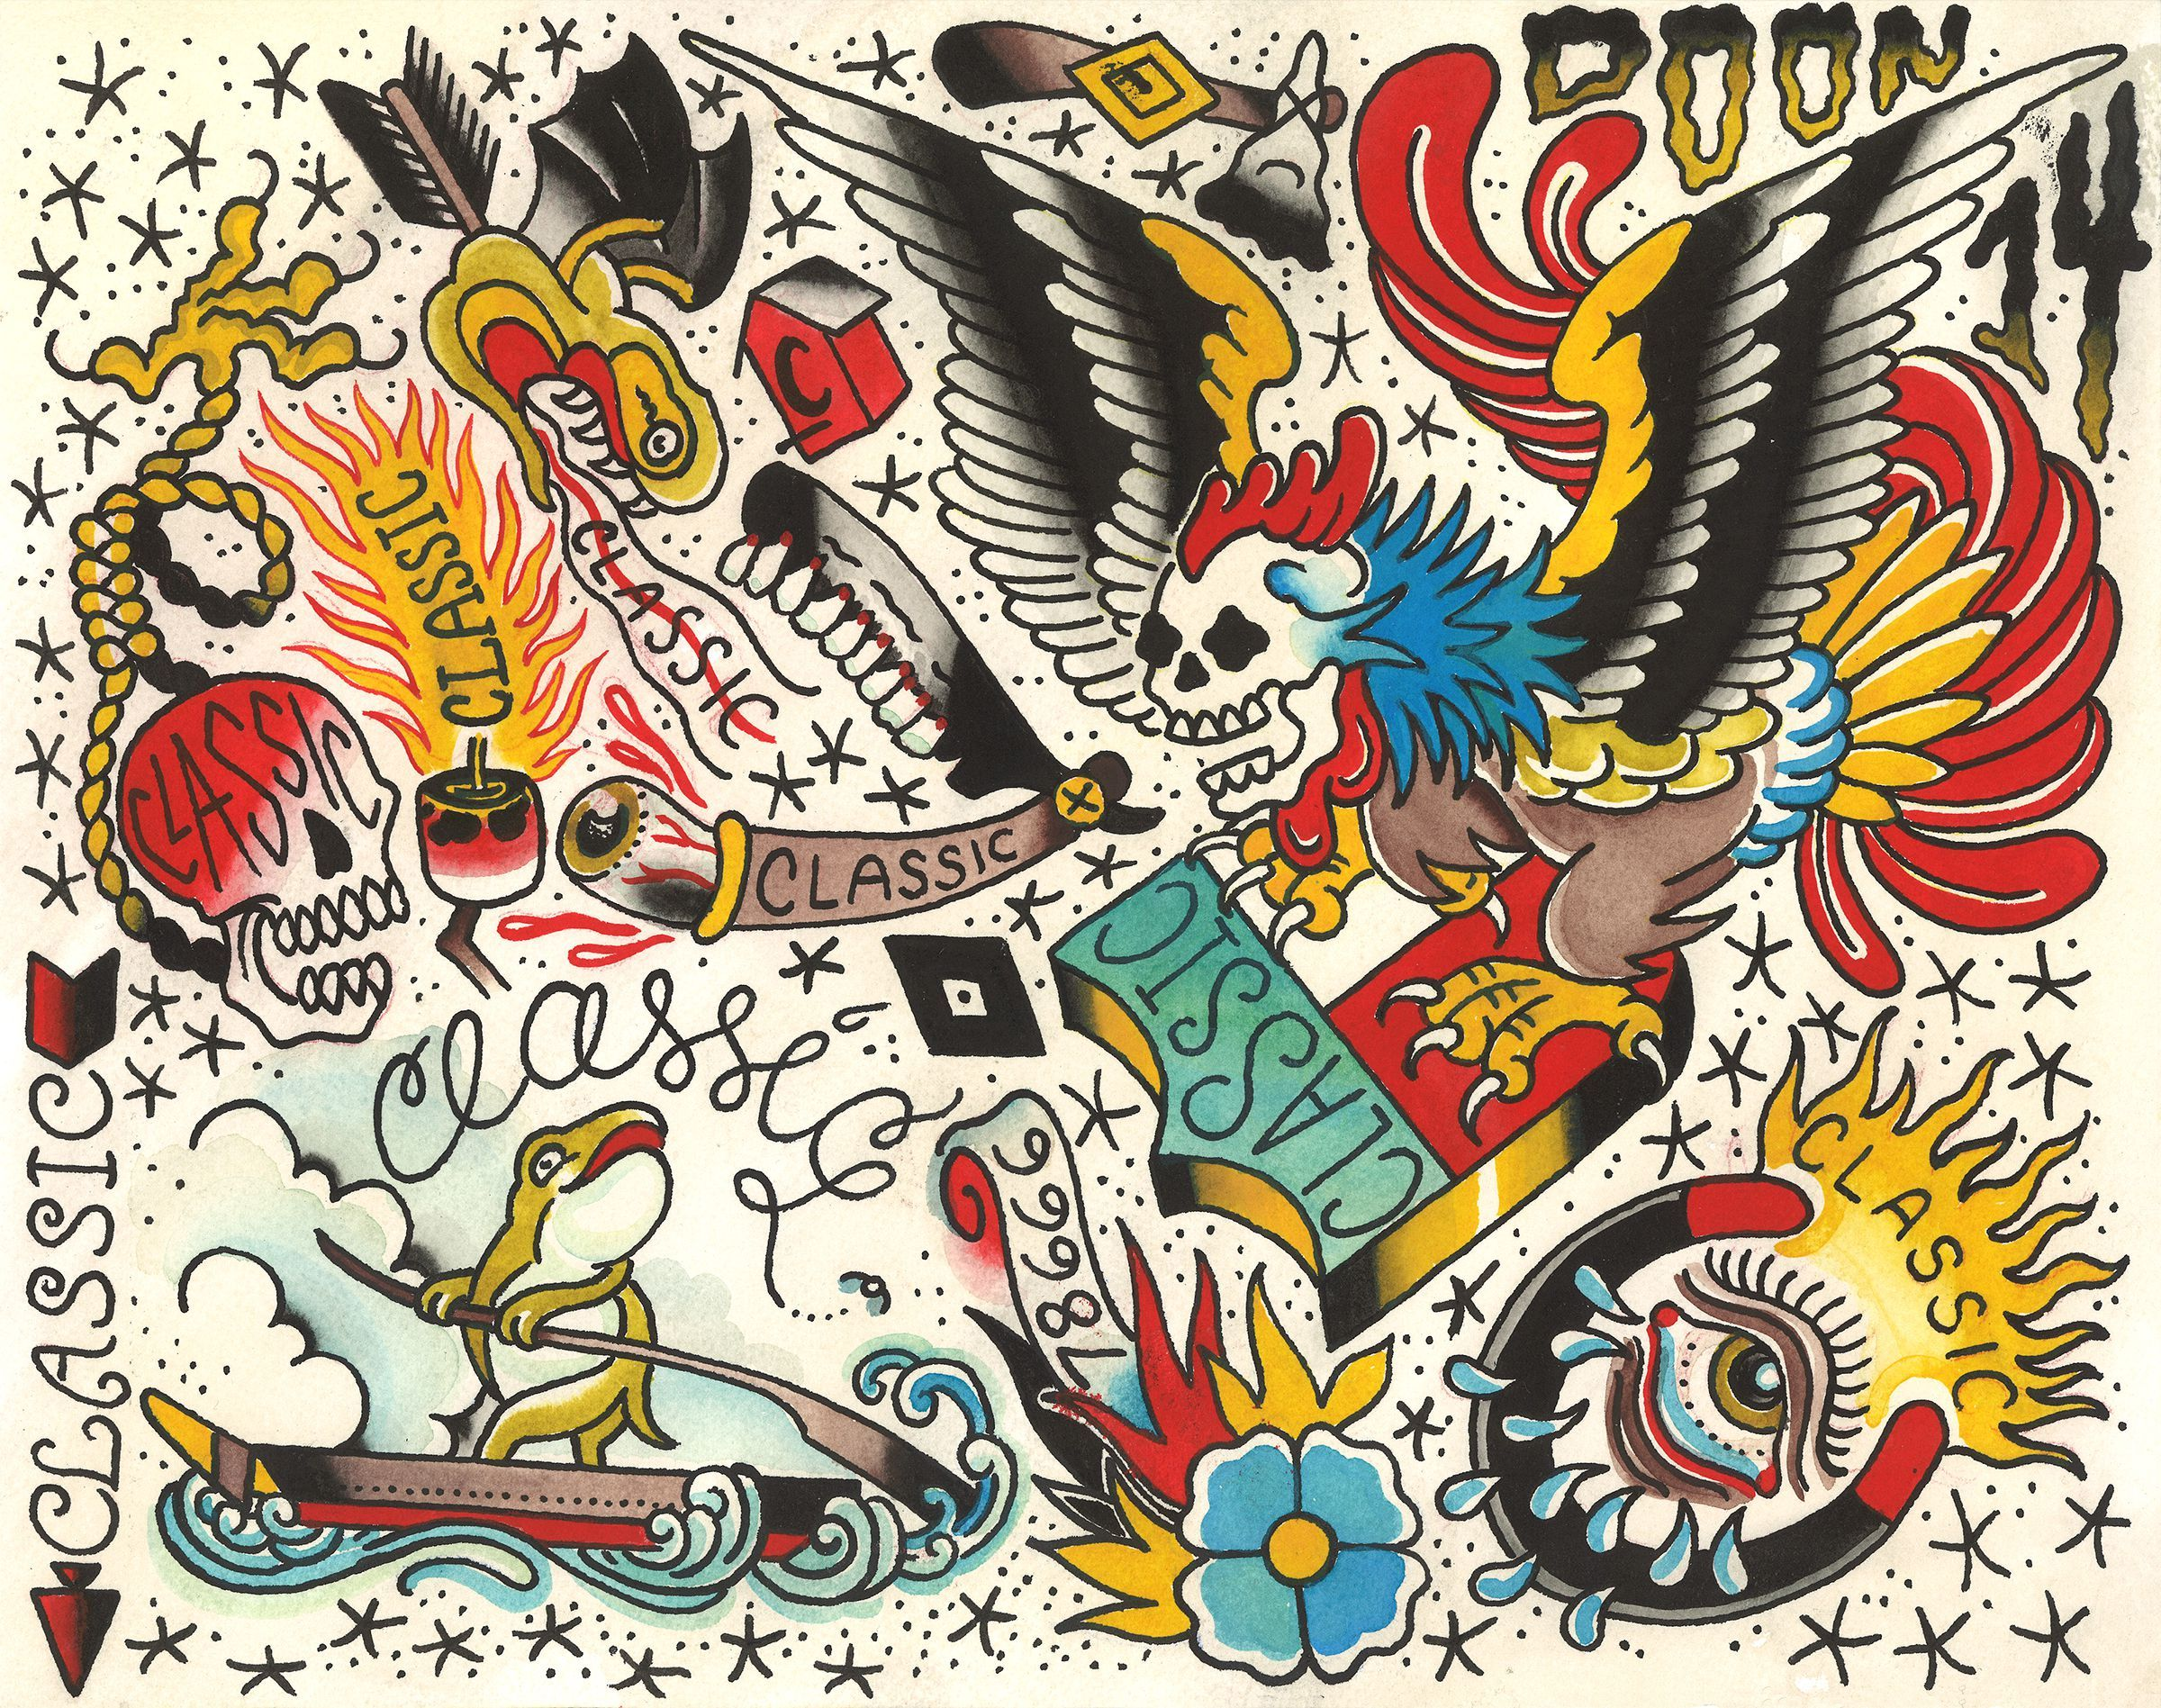 Pin By Simplyalbin On Tattoo Designs In 2020 Classic Tattoo American Traditional Tattoo Beautiful Tattoos